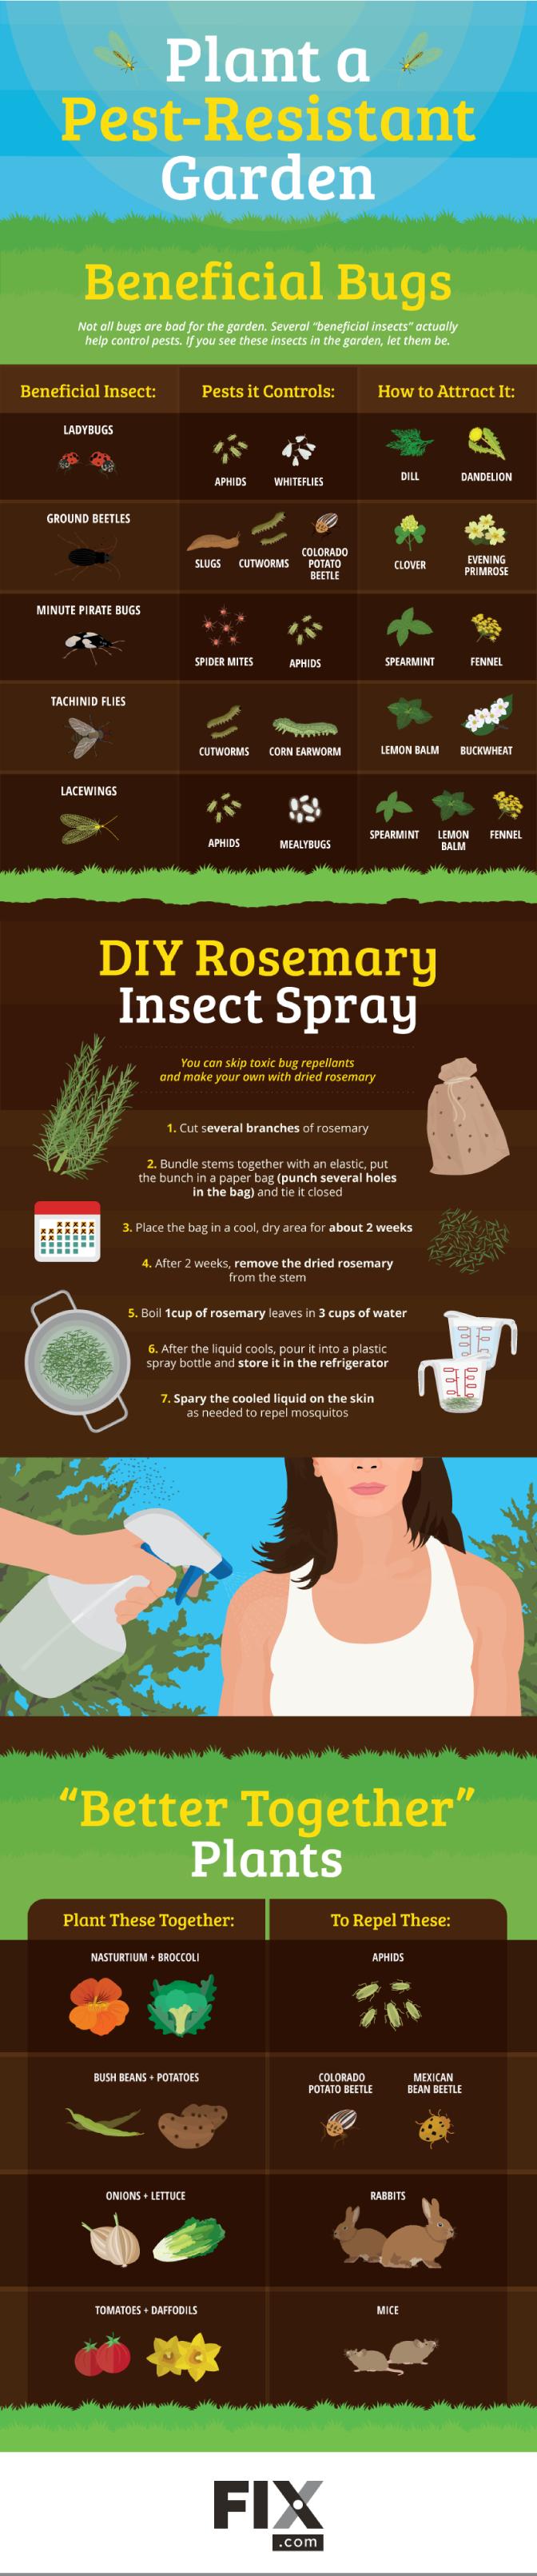 Plant a Pest-Resistant Garden #infographic